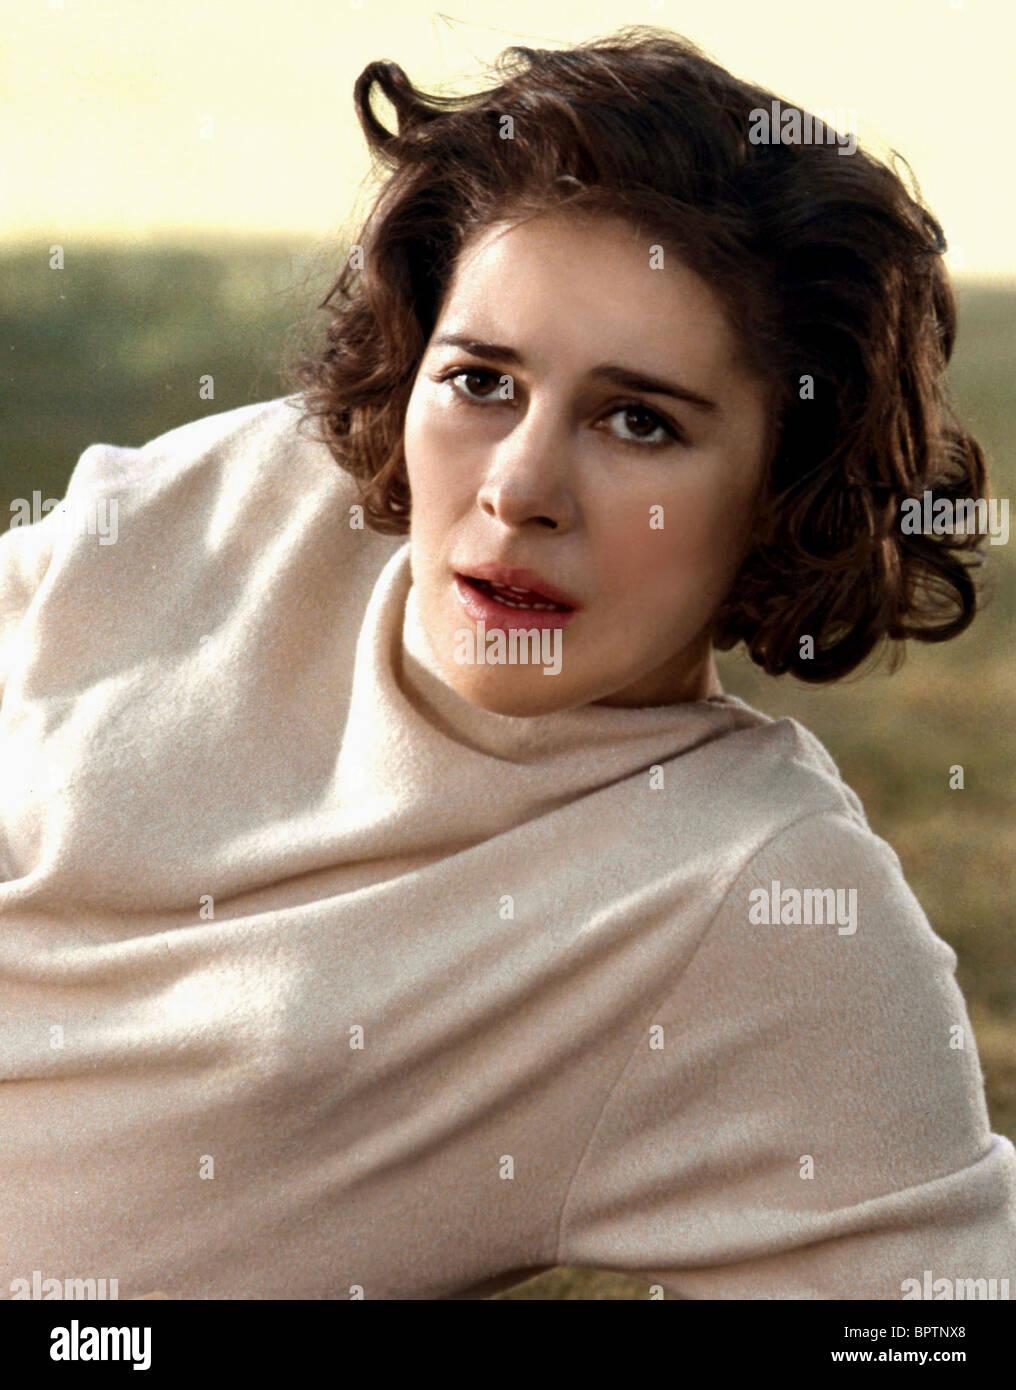 Forum on this topic: Nadia Bjorlin, jennifer-howard-actress/